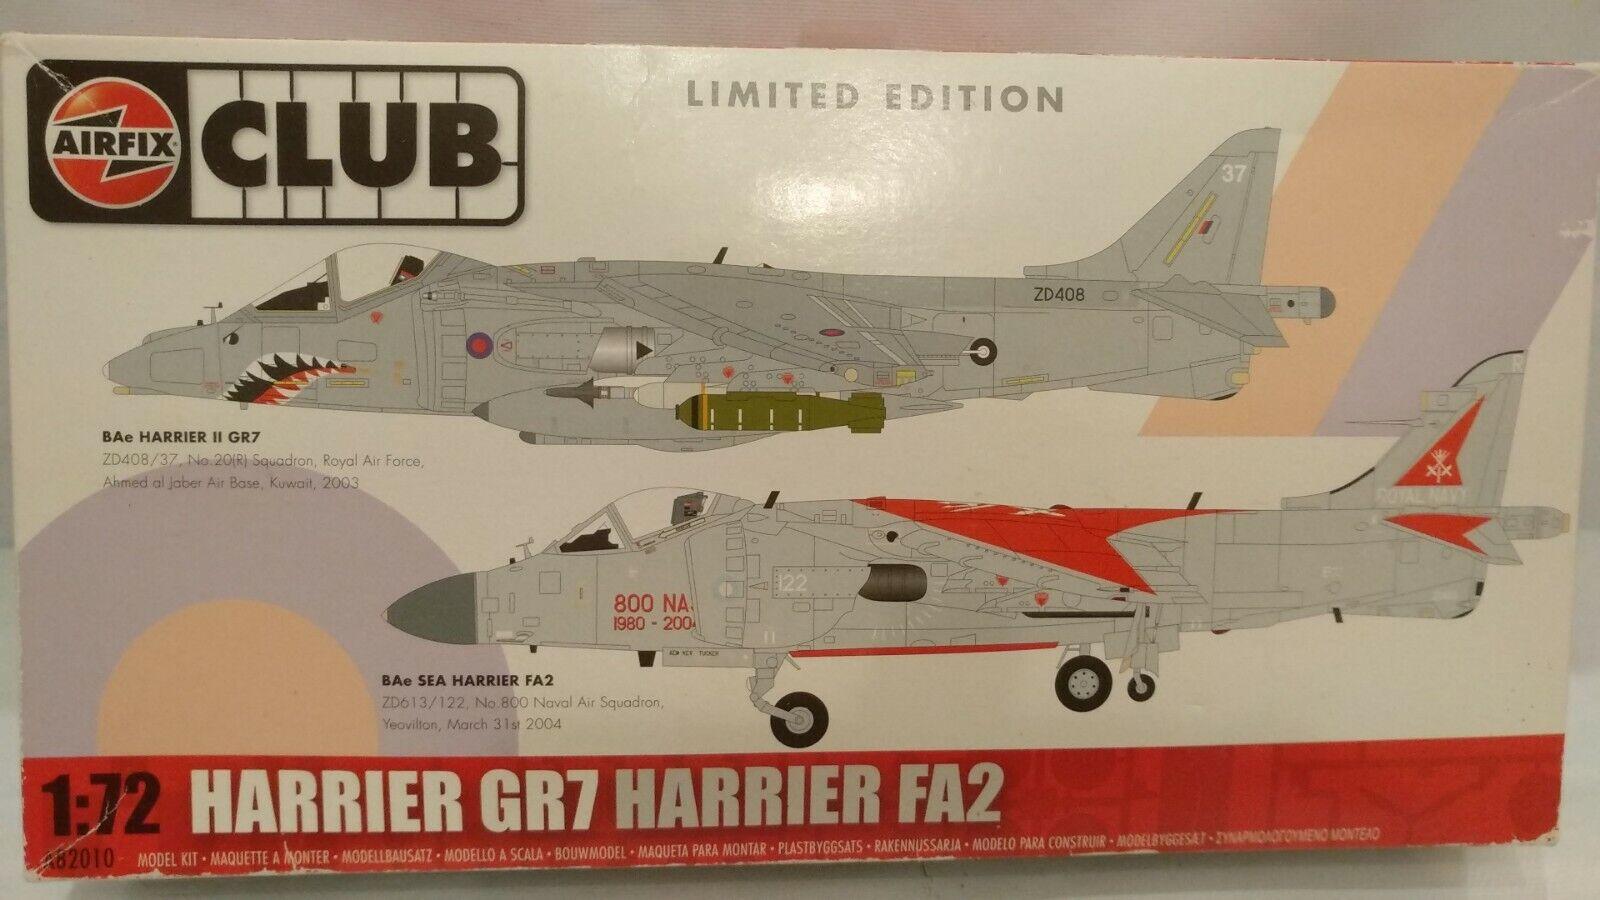 Vintage 1 72 Airfix Club BAe Harrier II GR7 & BAe Sea Harrier FA2 Aircraft Model